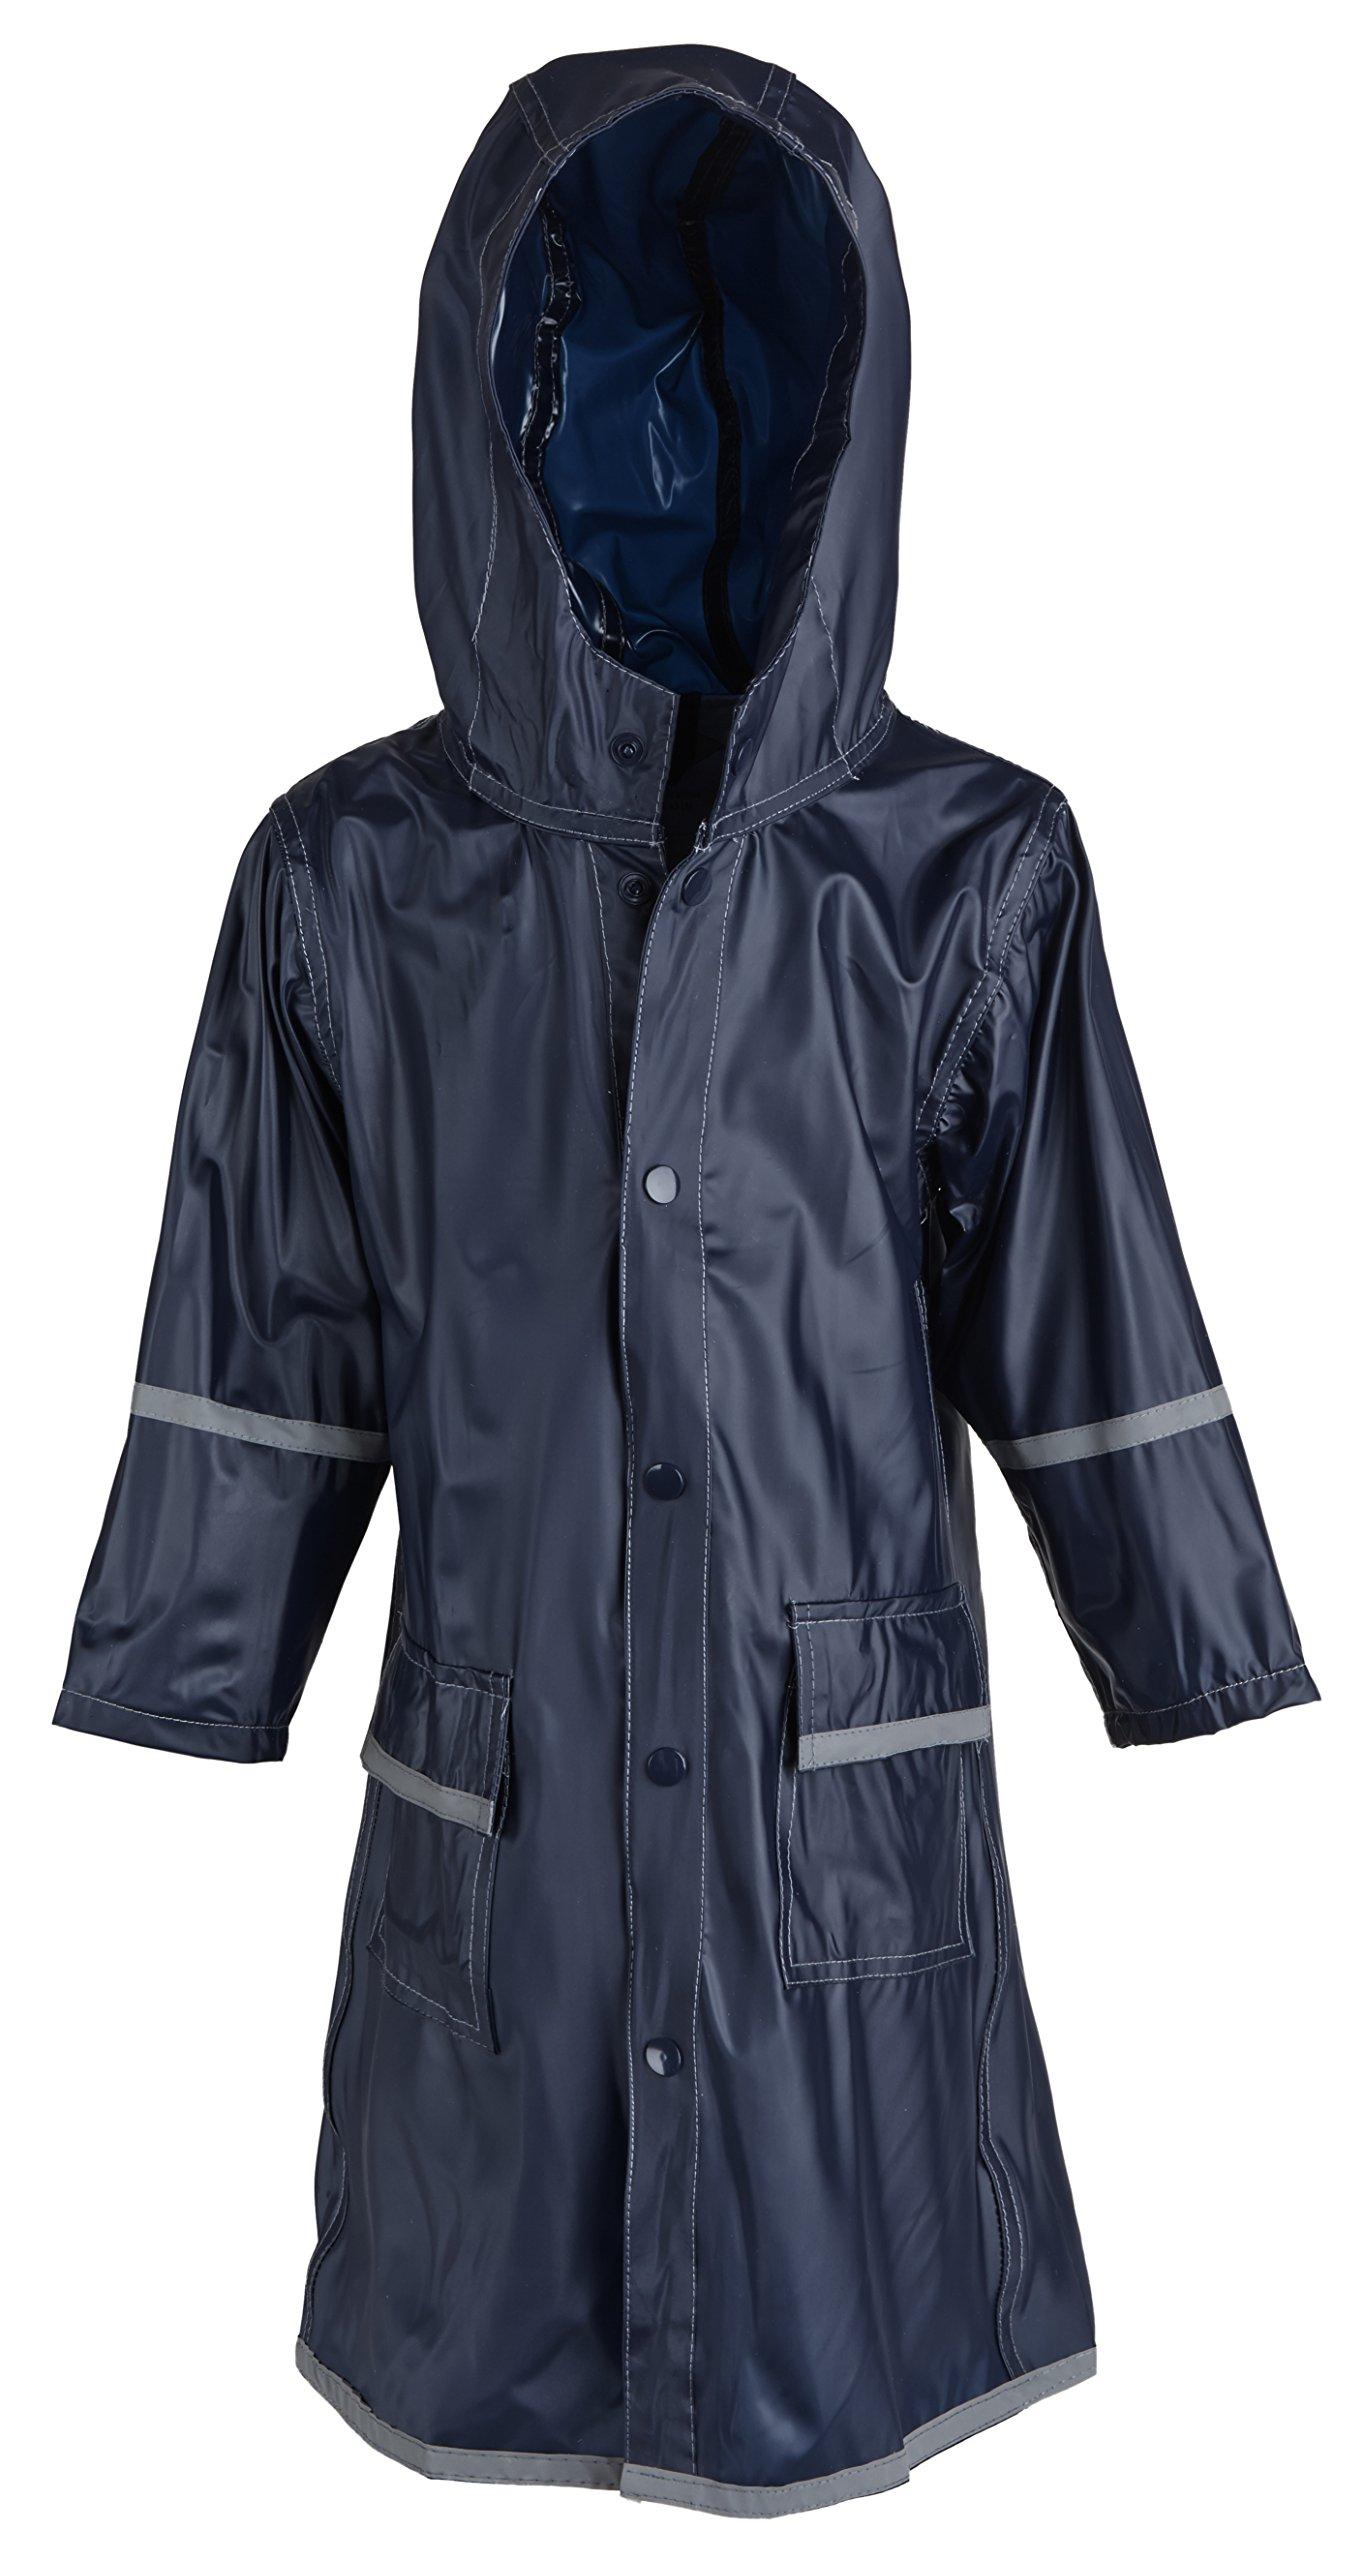 Big Boys Kids Waterproof Full Length Long Hooded Raincoat Jacket for Children - Blue (X-Large)